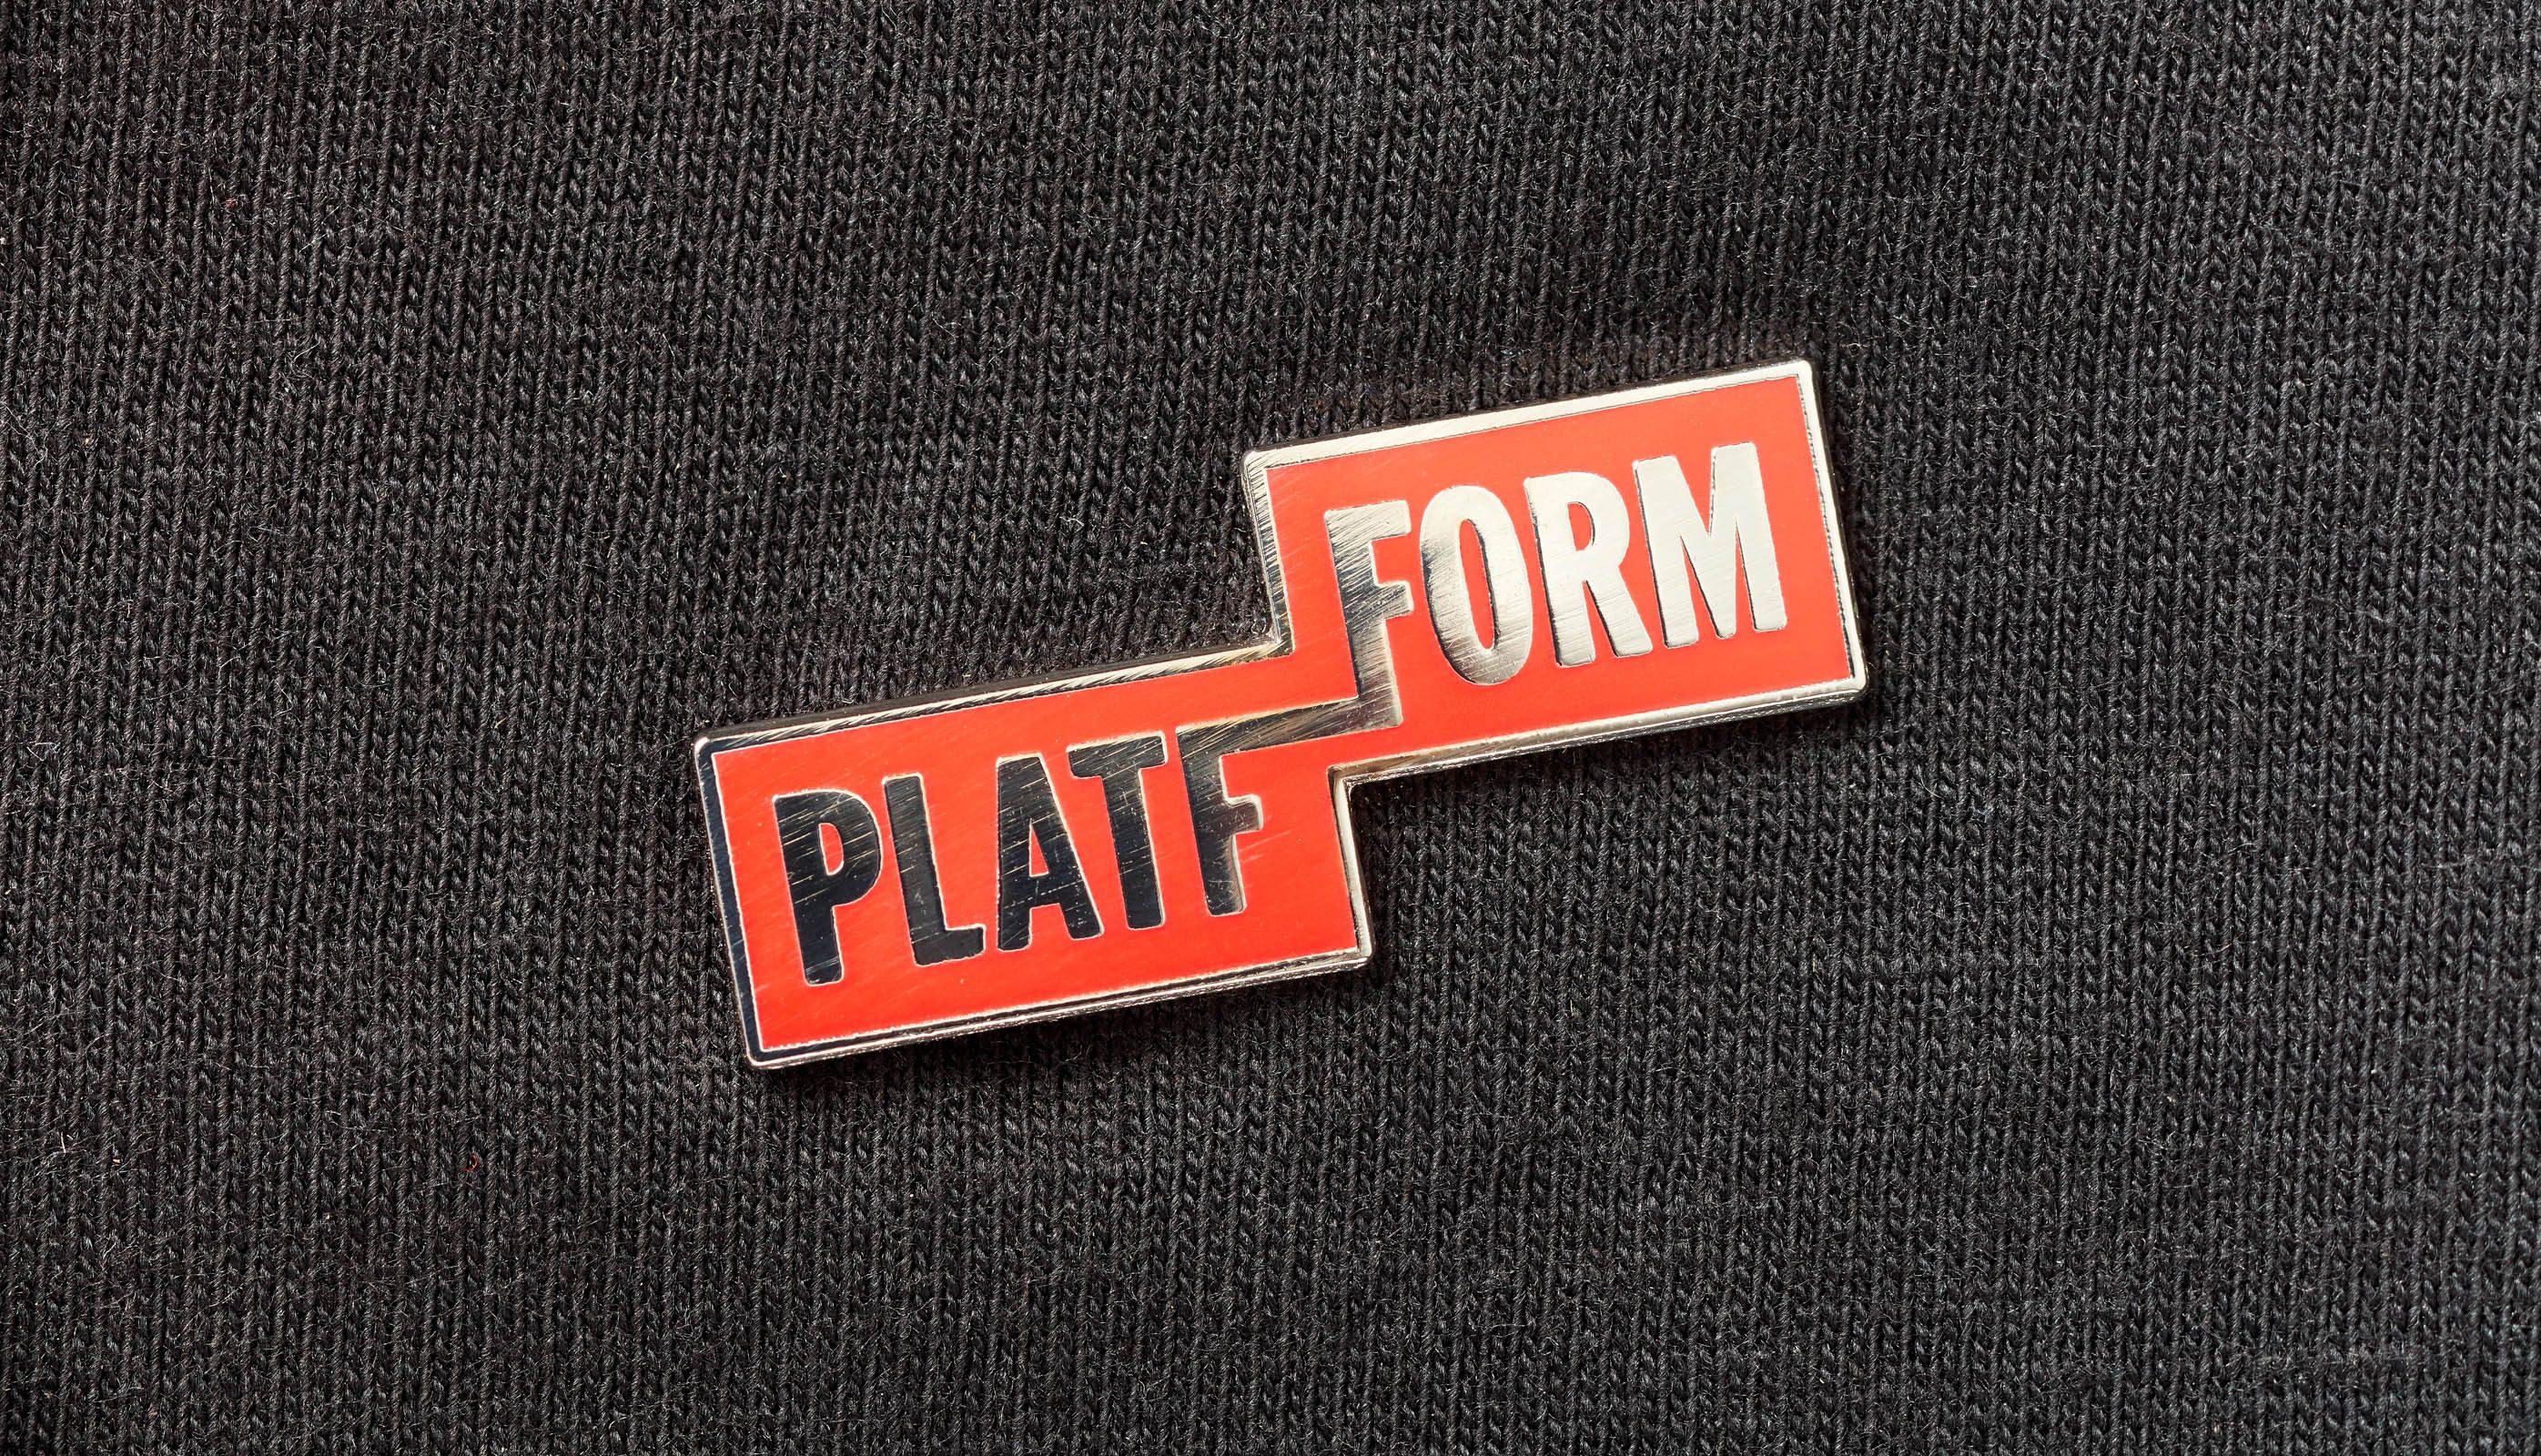 Platfform lapel badge